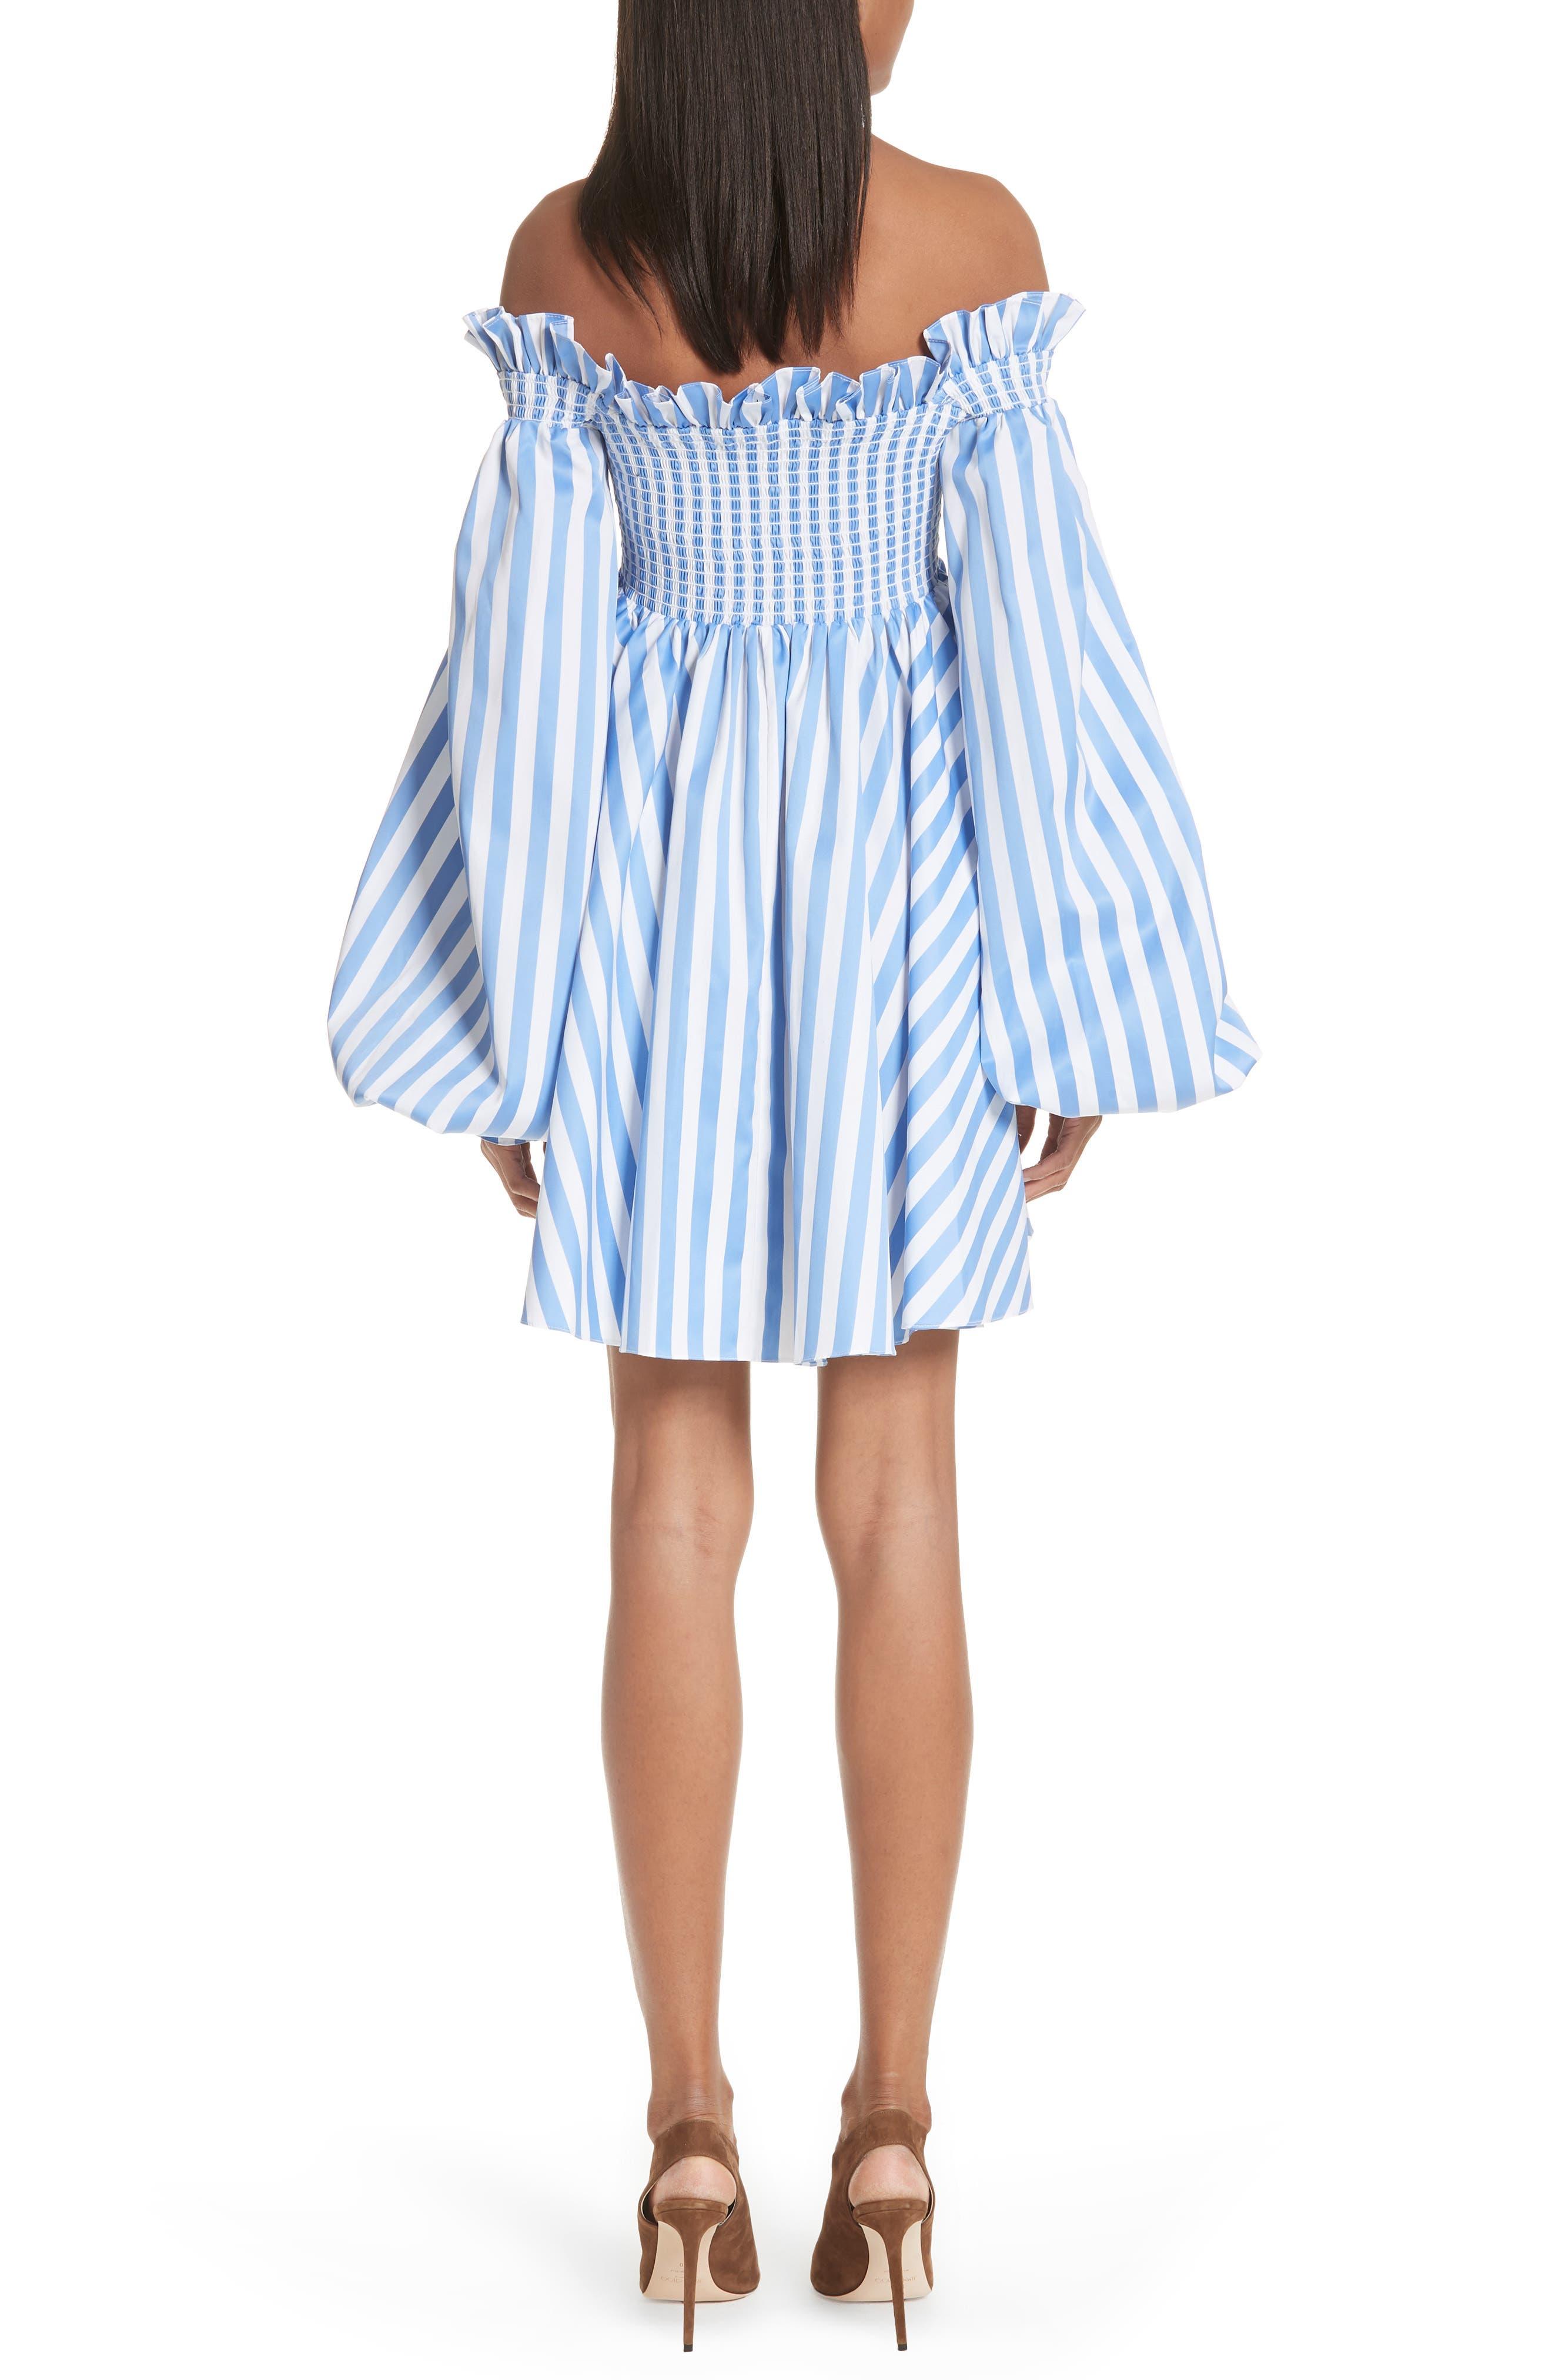 Kora Stripe Off the Shoulder Dress,                             Alternate thumbnail 2, color,                             Blue/ White